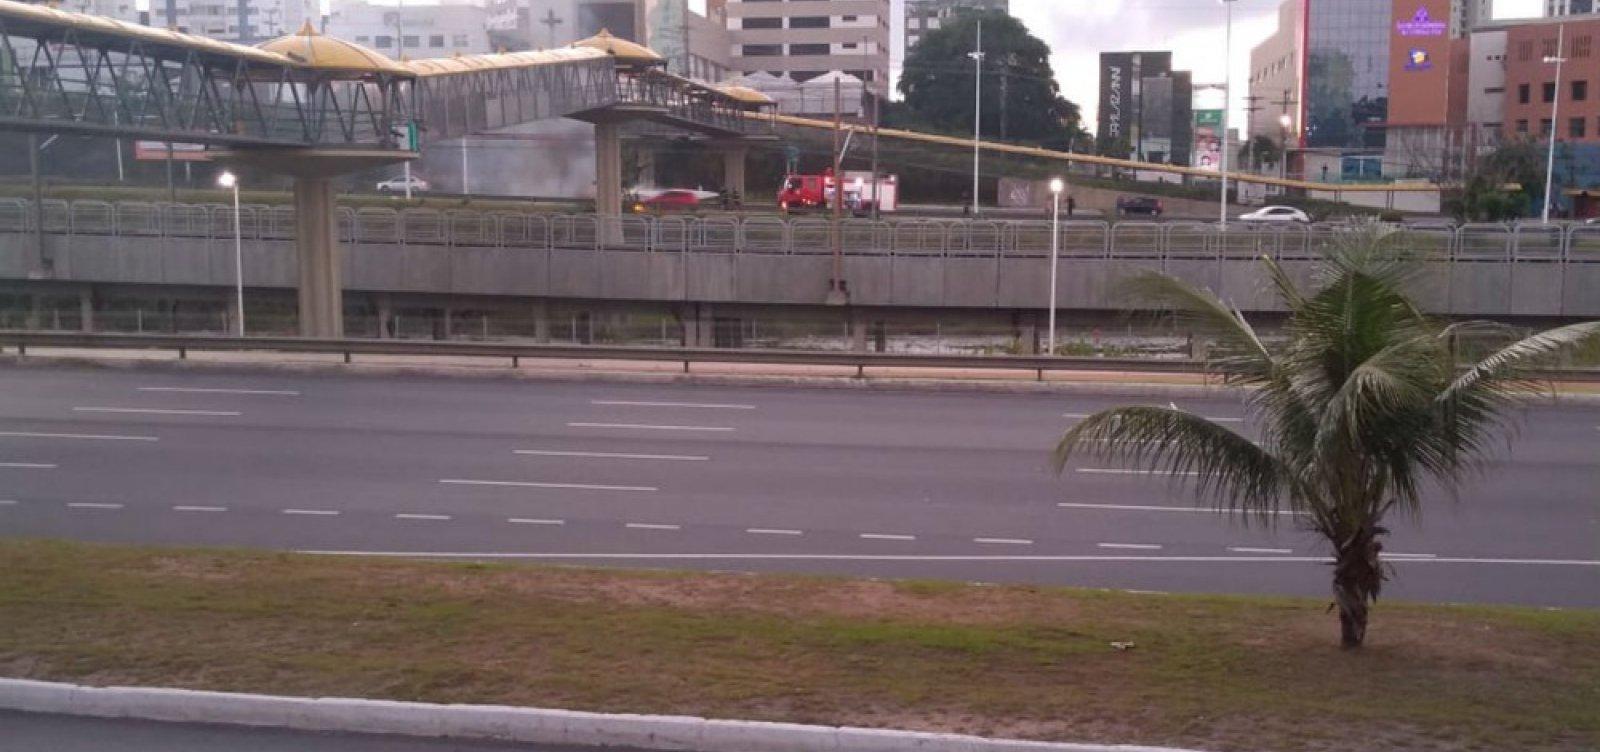 Carro pega fogo na Avenida Paralela